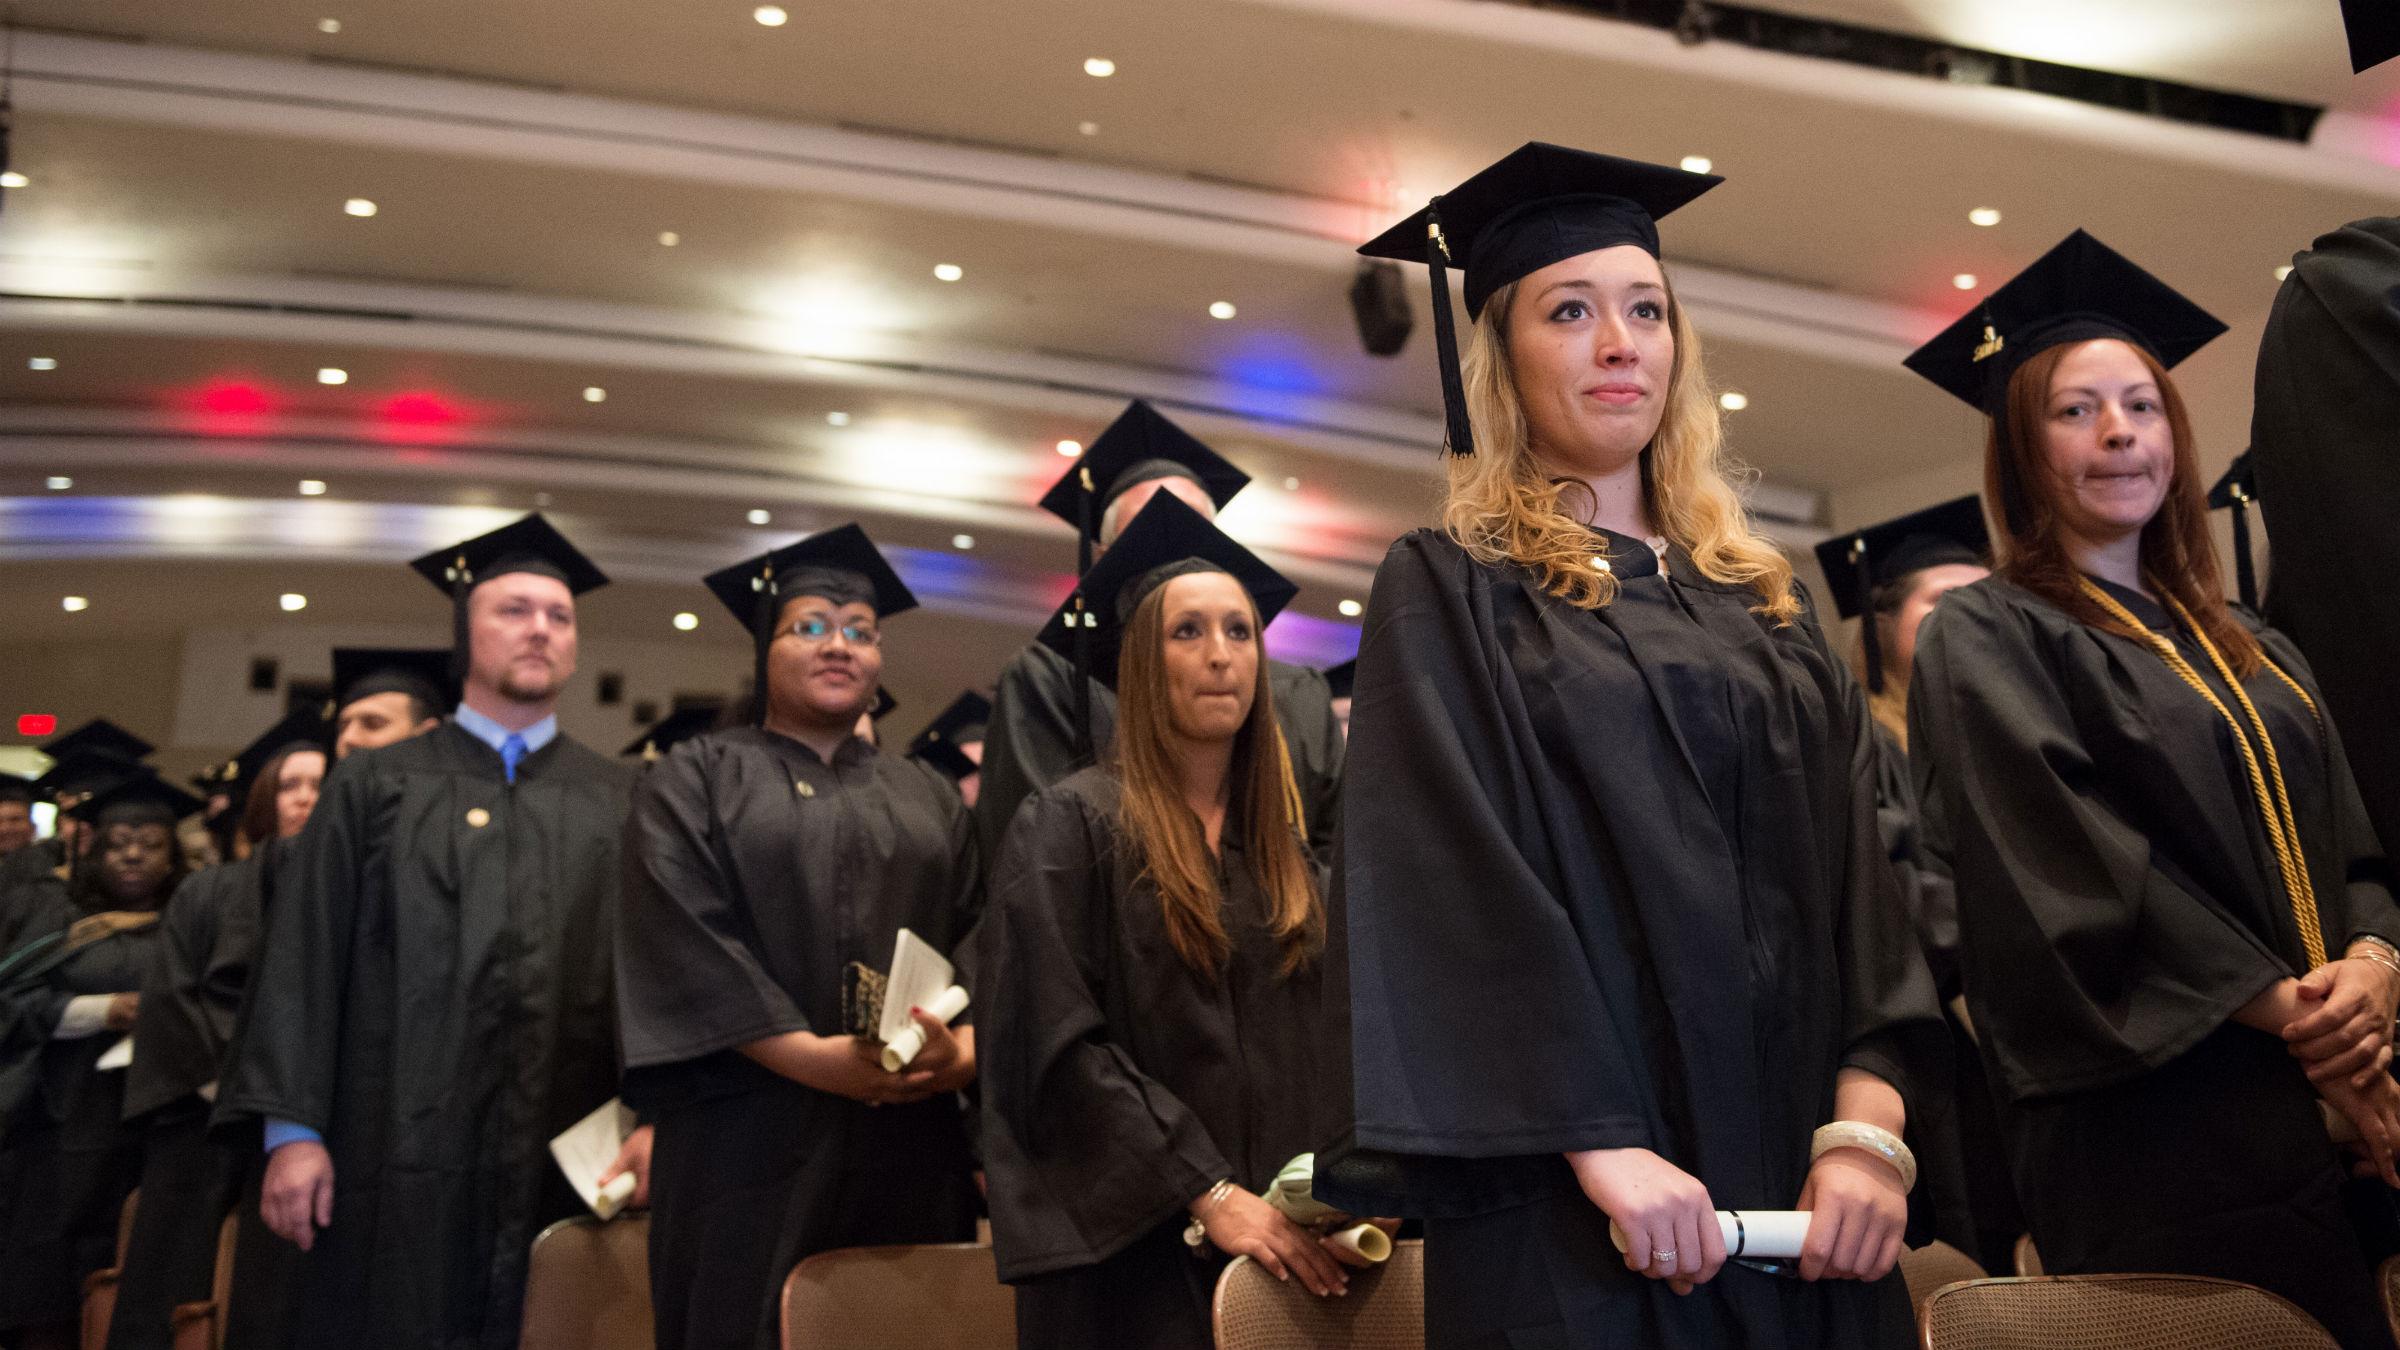 Business graduation ceremony